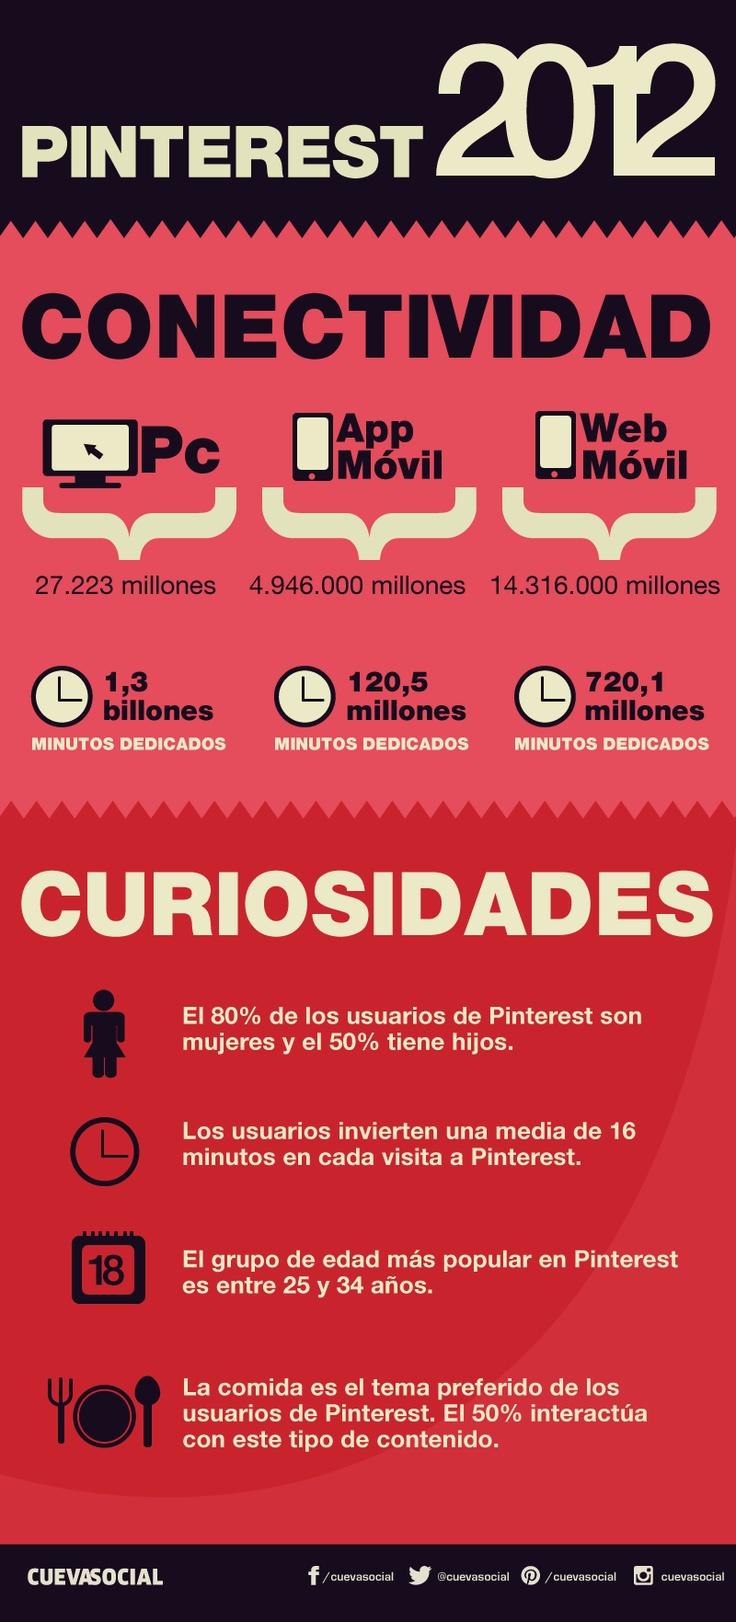 Pinterest 2012 en cifras | Infografía